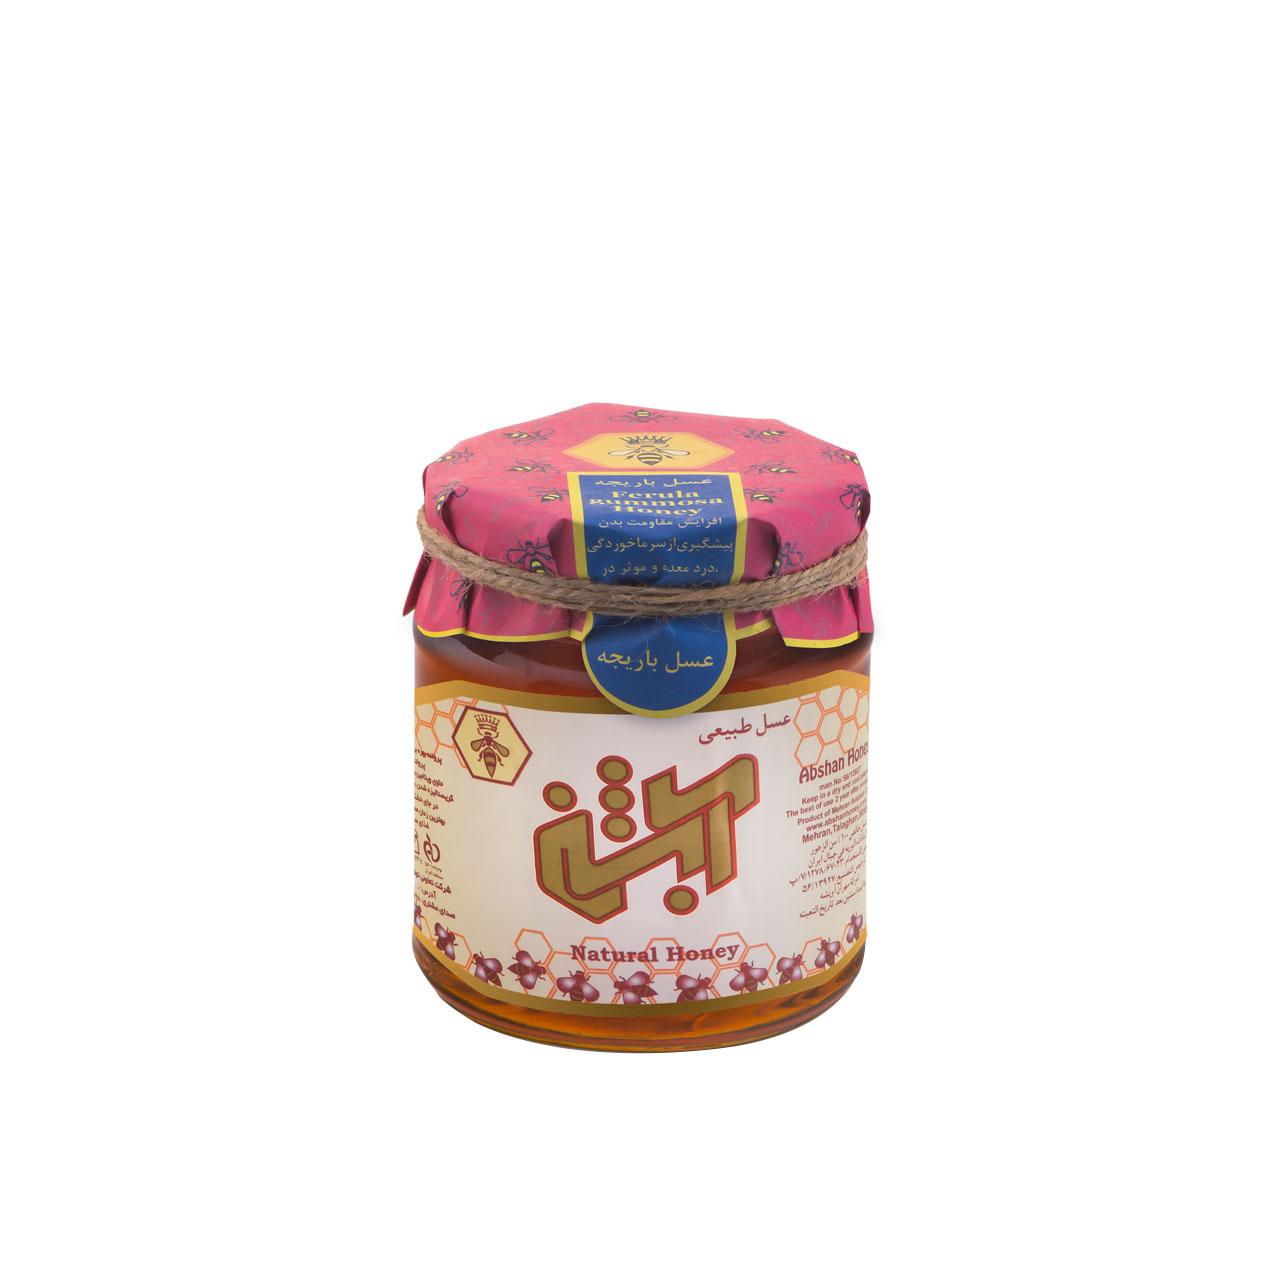 عسل باریجه آبشن - 390 گرم